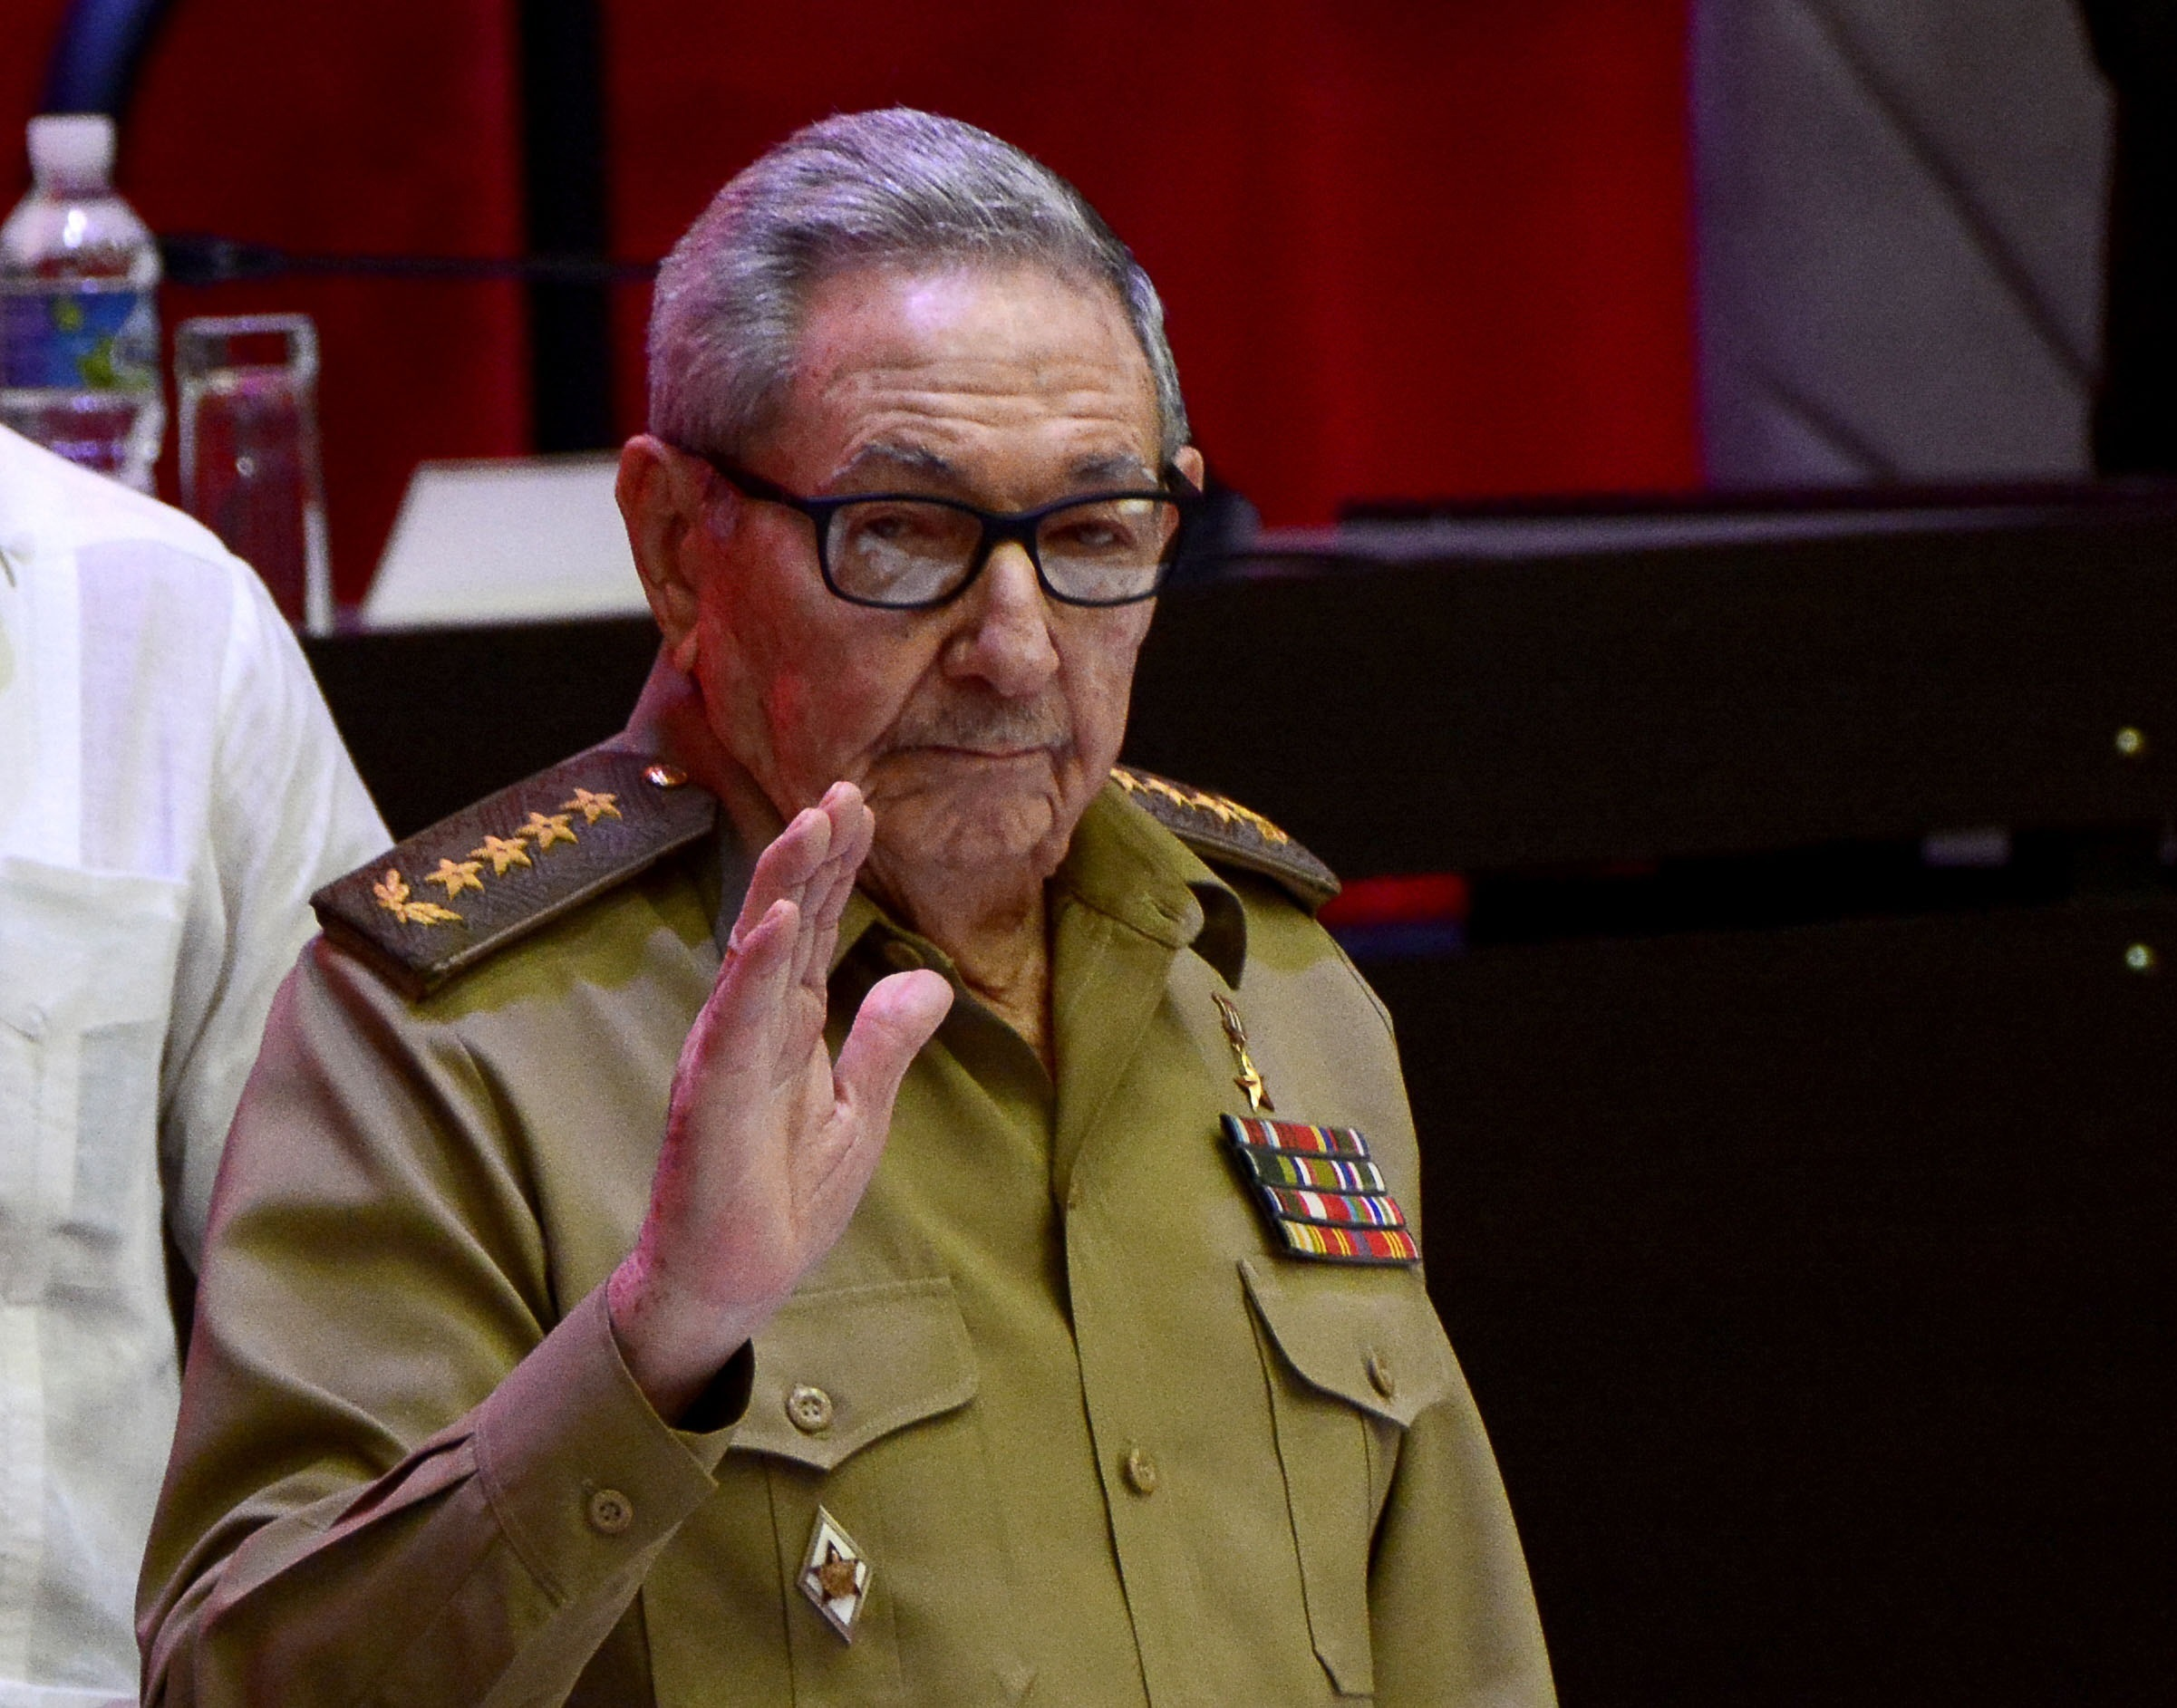 Raúl Castro, ex presidente de Cuba.